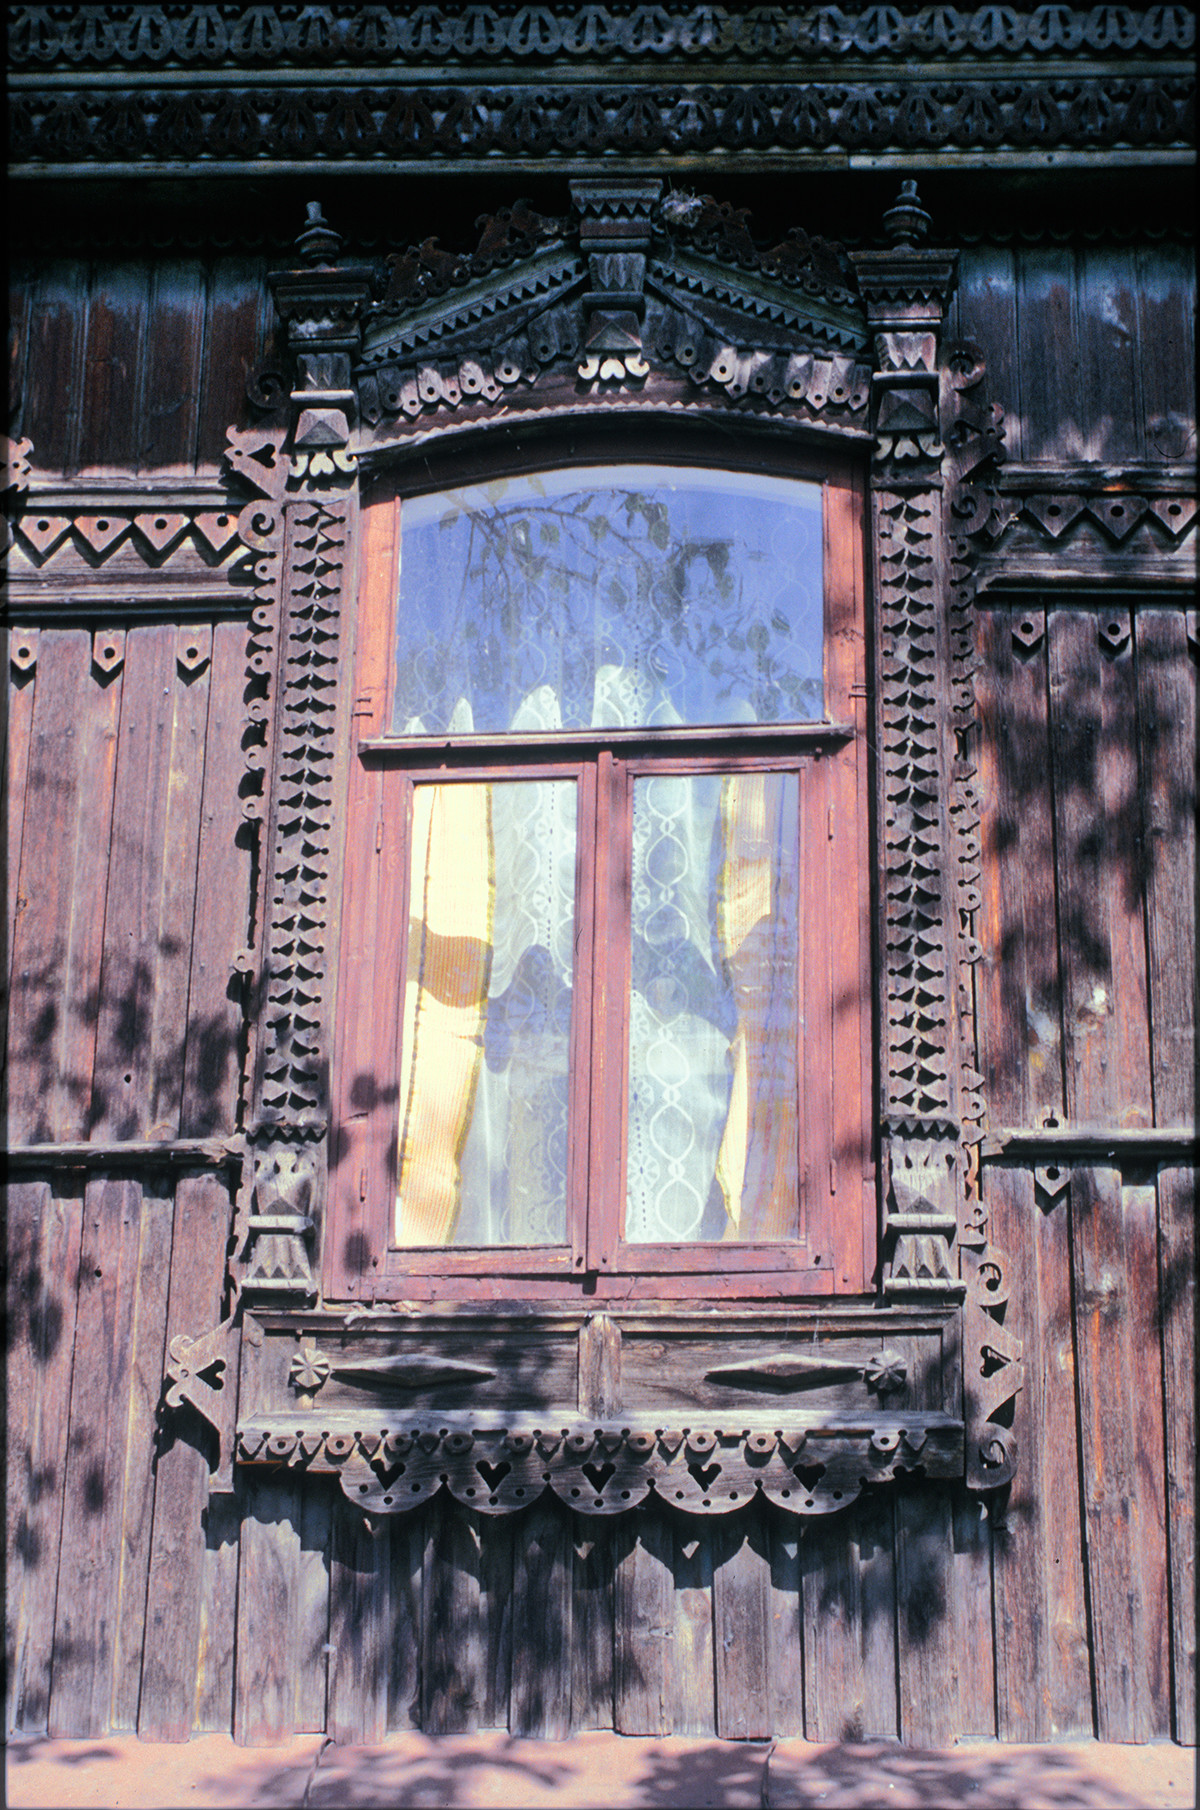 Window with decorative surround, Soviet Street 107. July 15, 2003